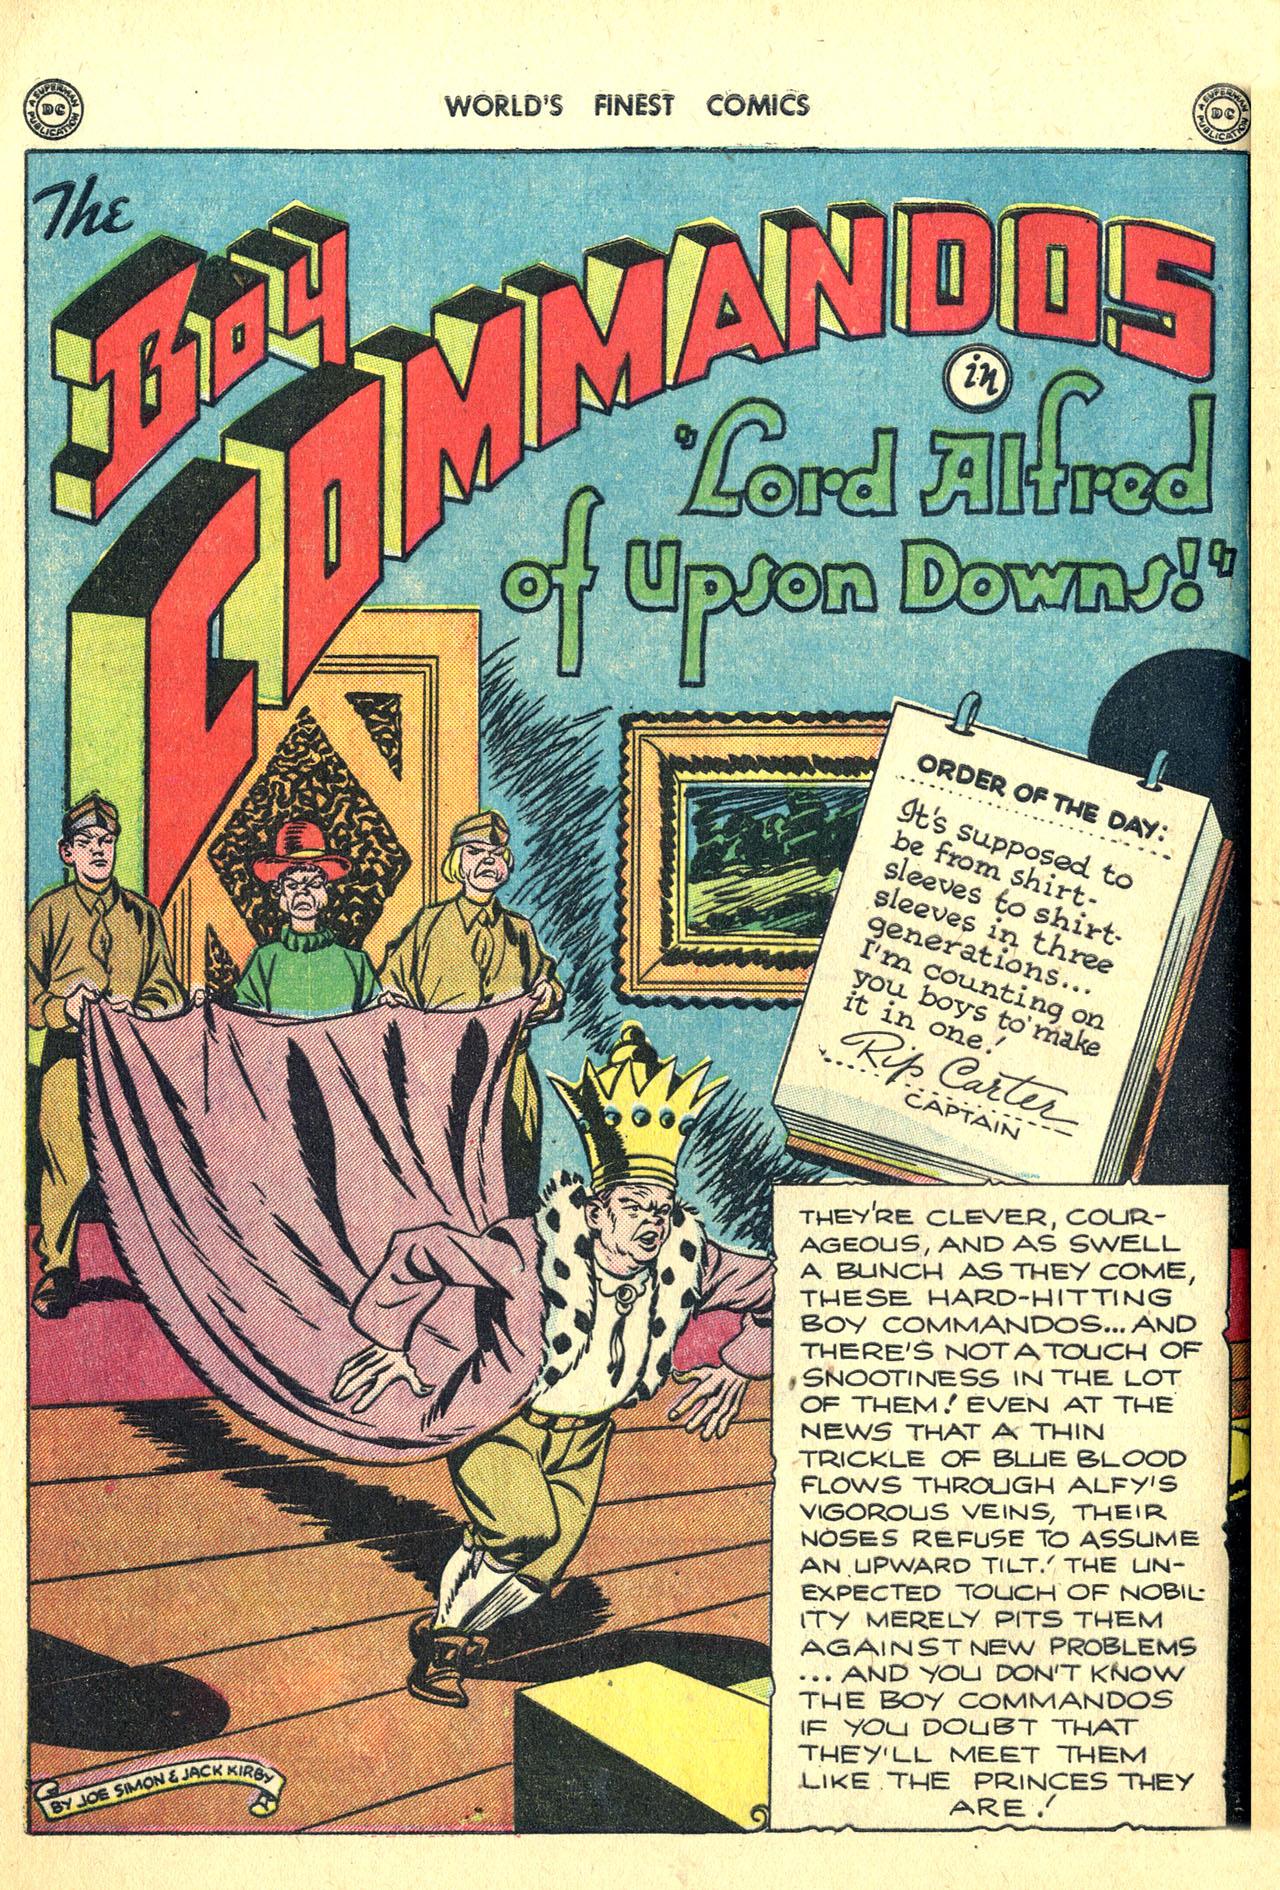 Read online World's Finest Comics comic -  Issue #18 - 36